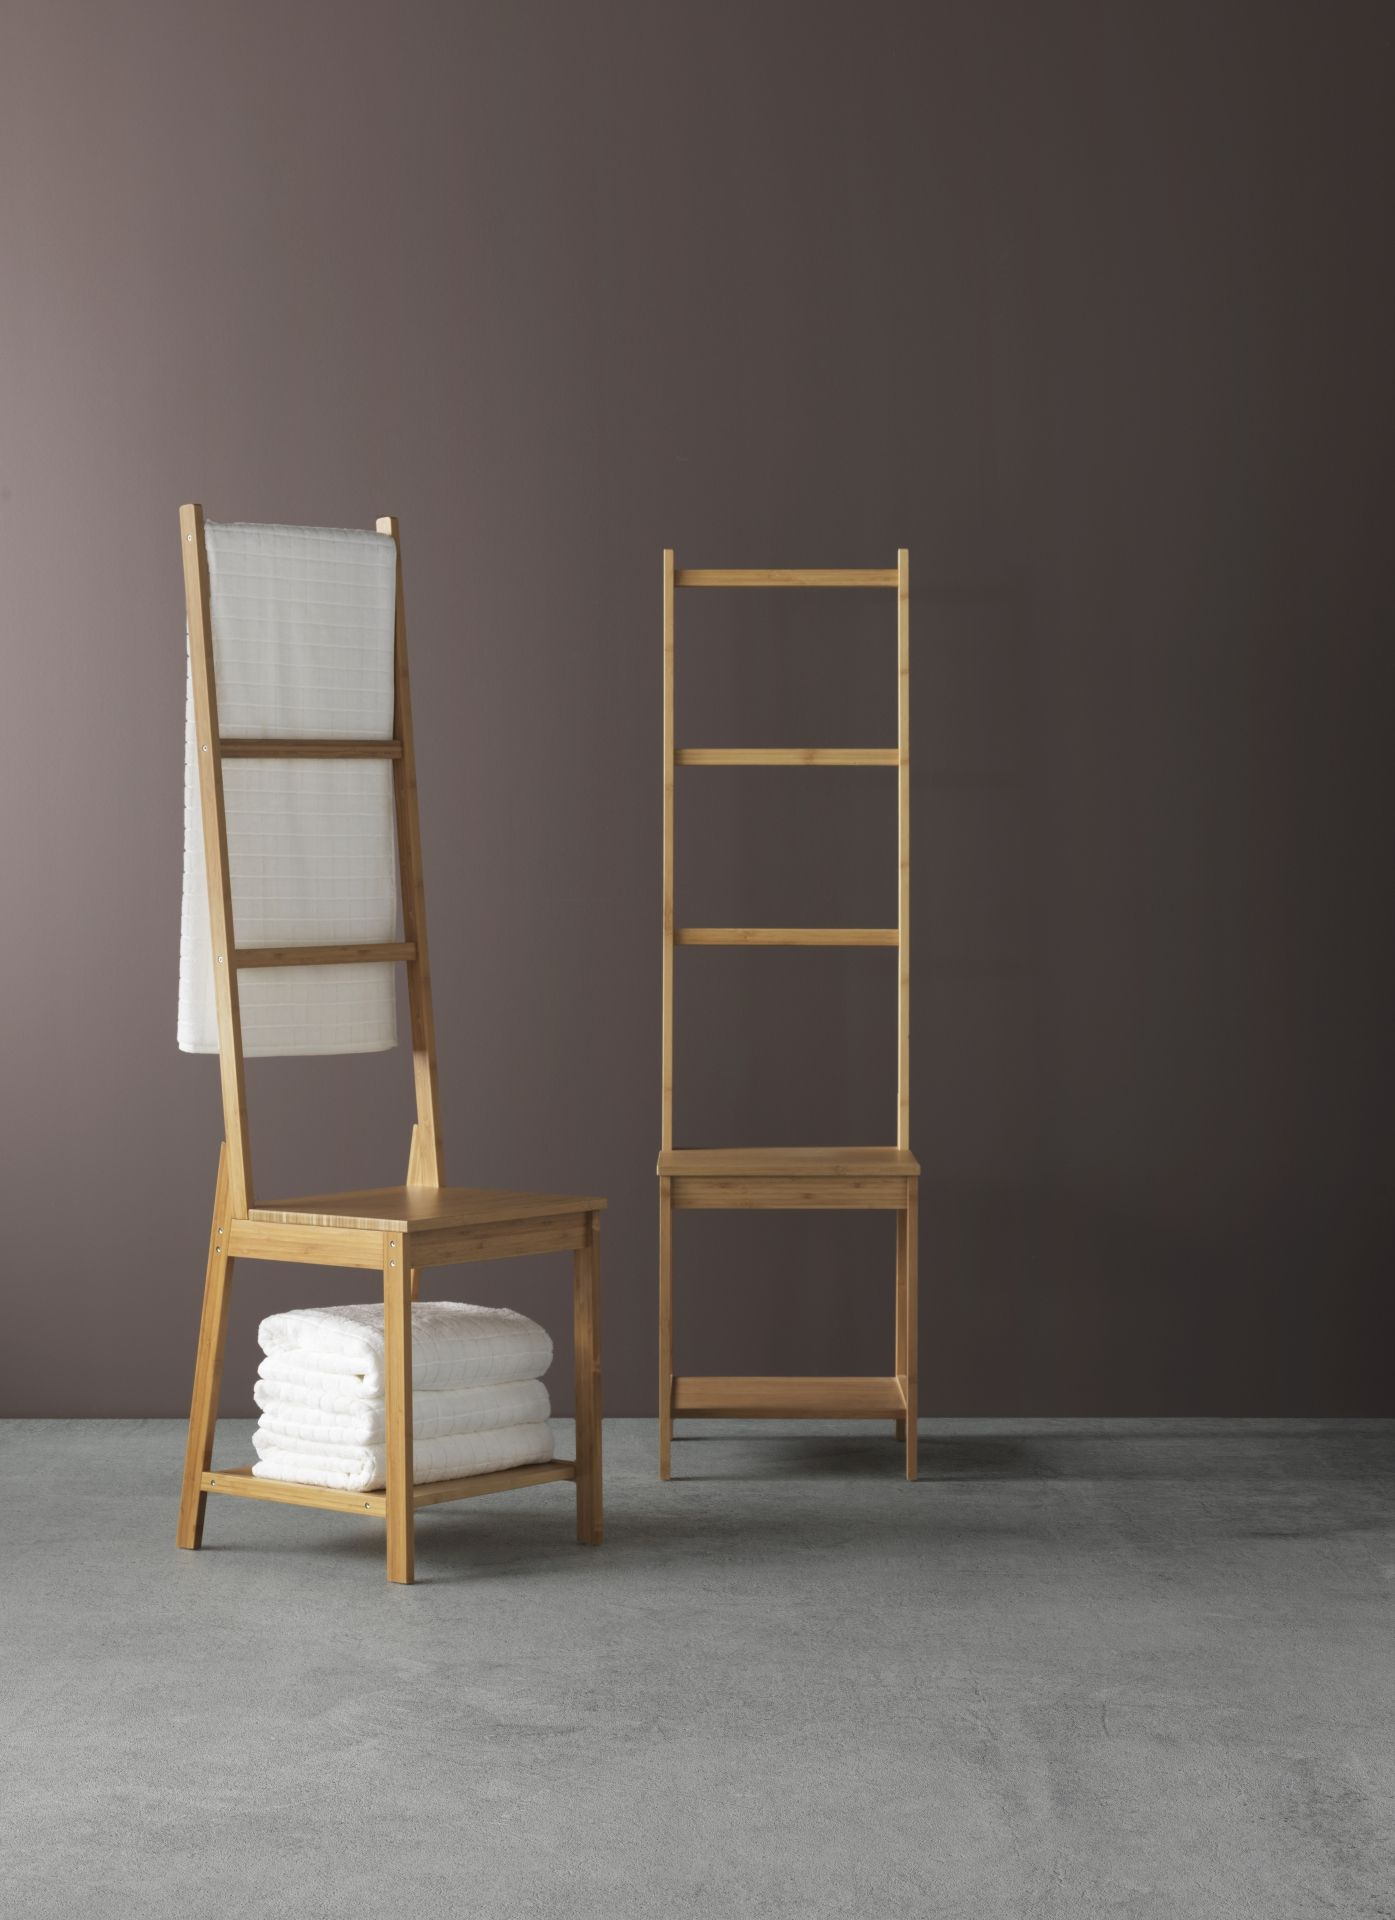 RÅGRUND Stoel met handdoekenrek, bamboe | IKEA ideeën | Pinterest ...